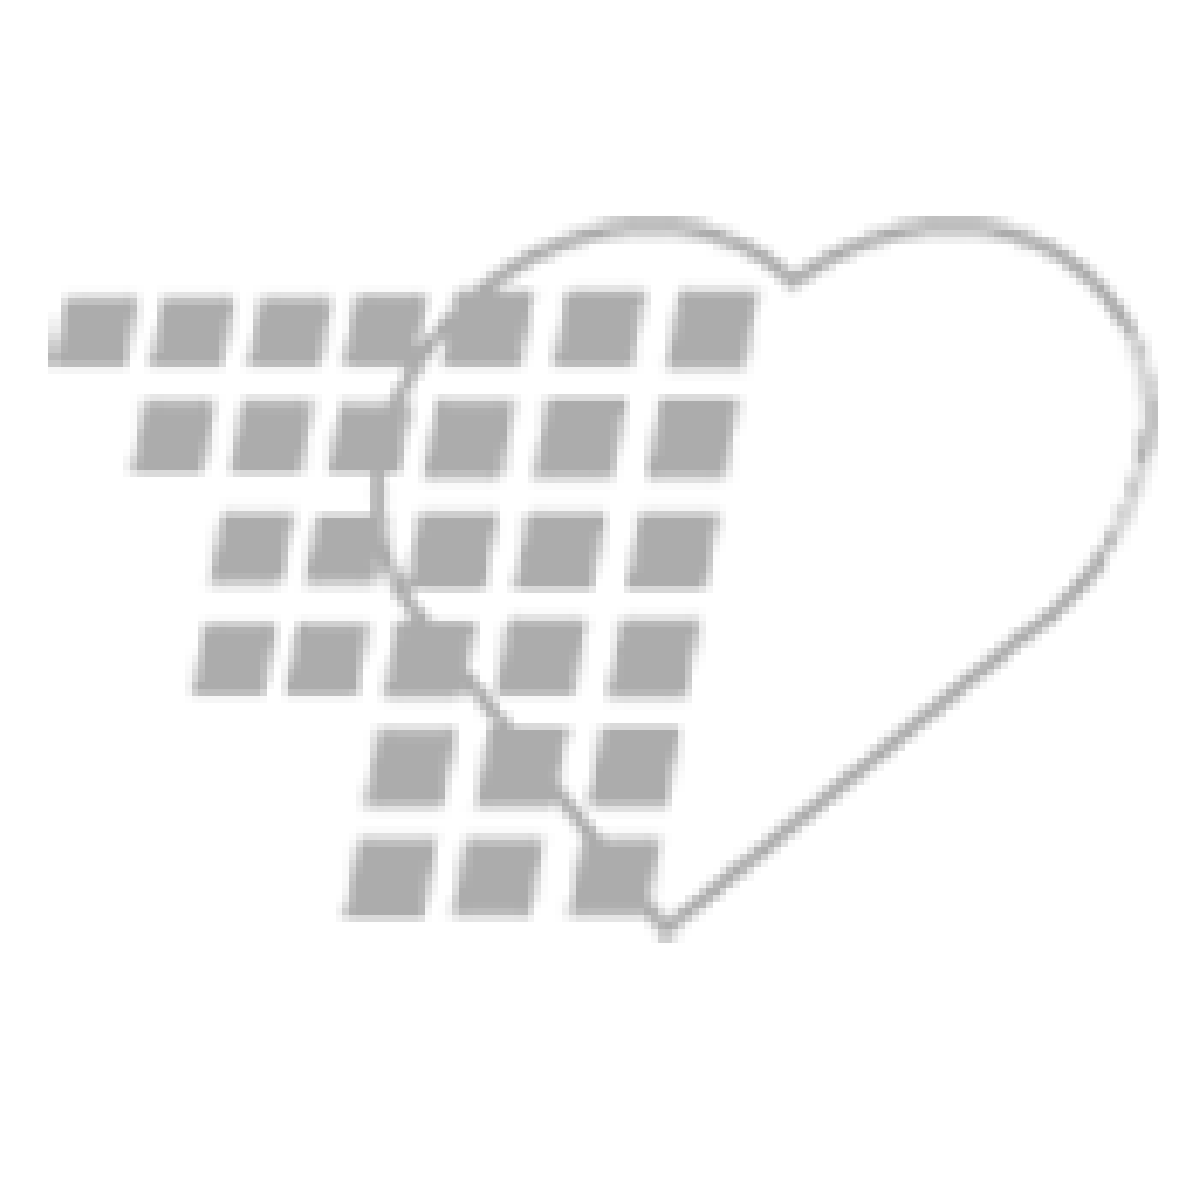 11-81-0995 Nasco LifeForm® Arterial Puncture Arm